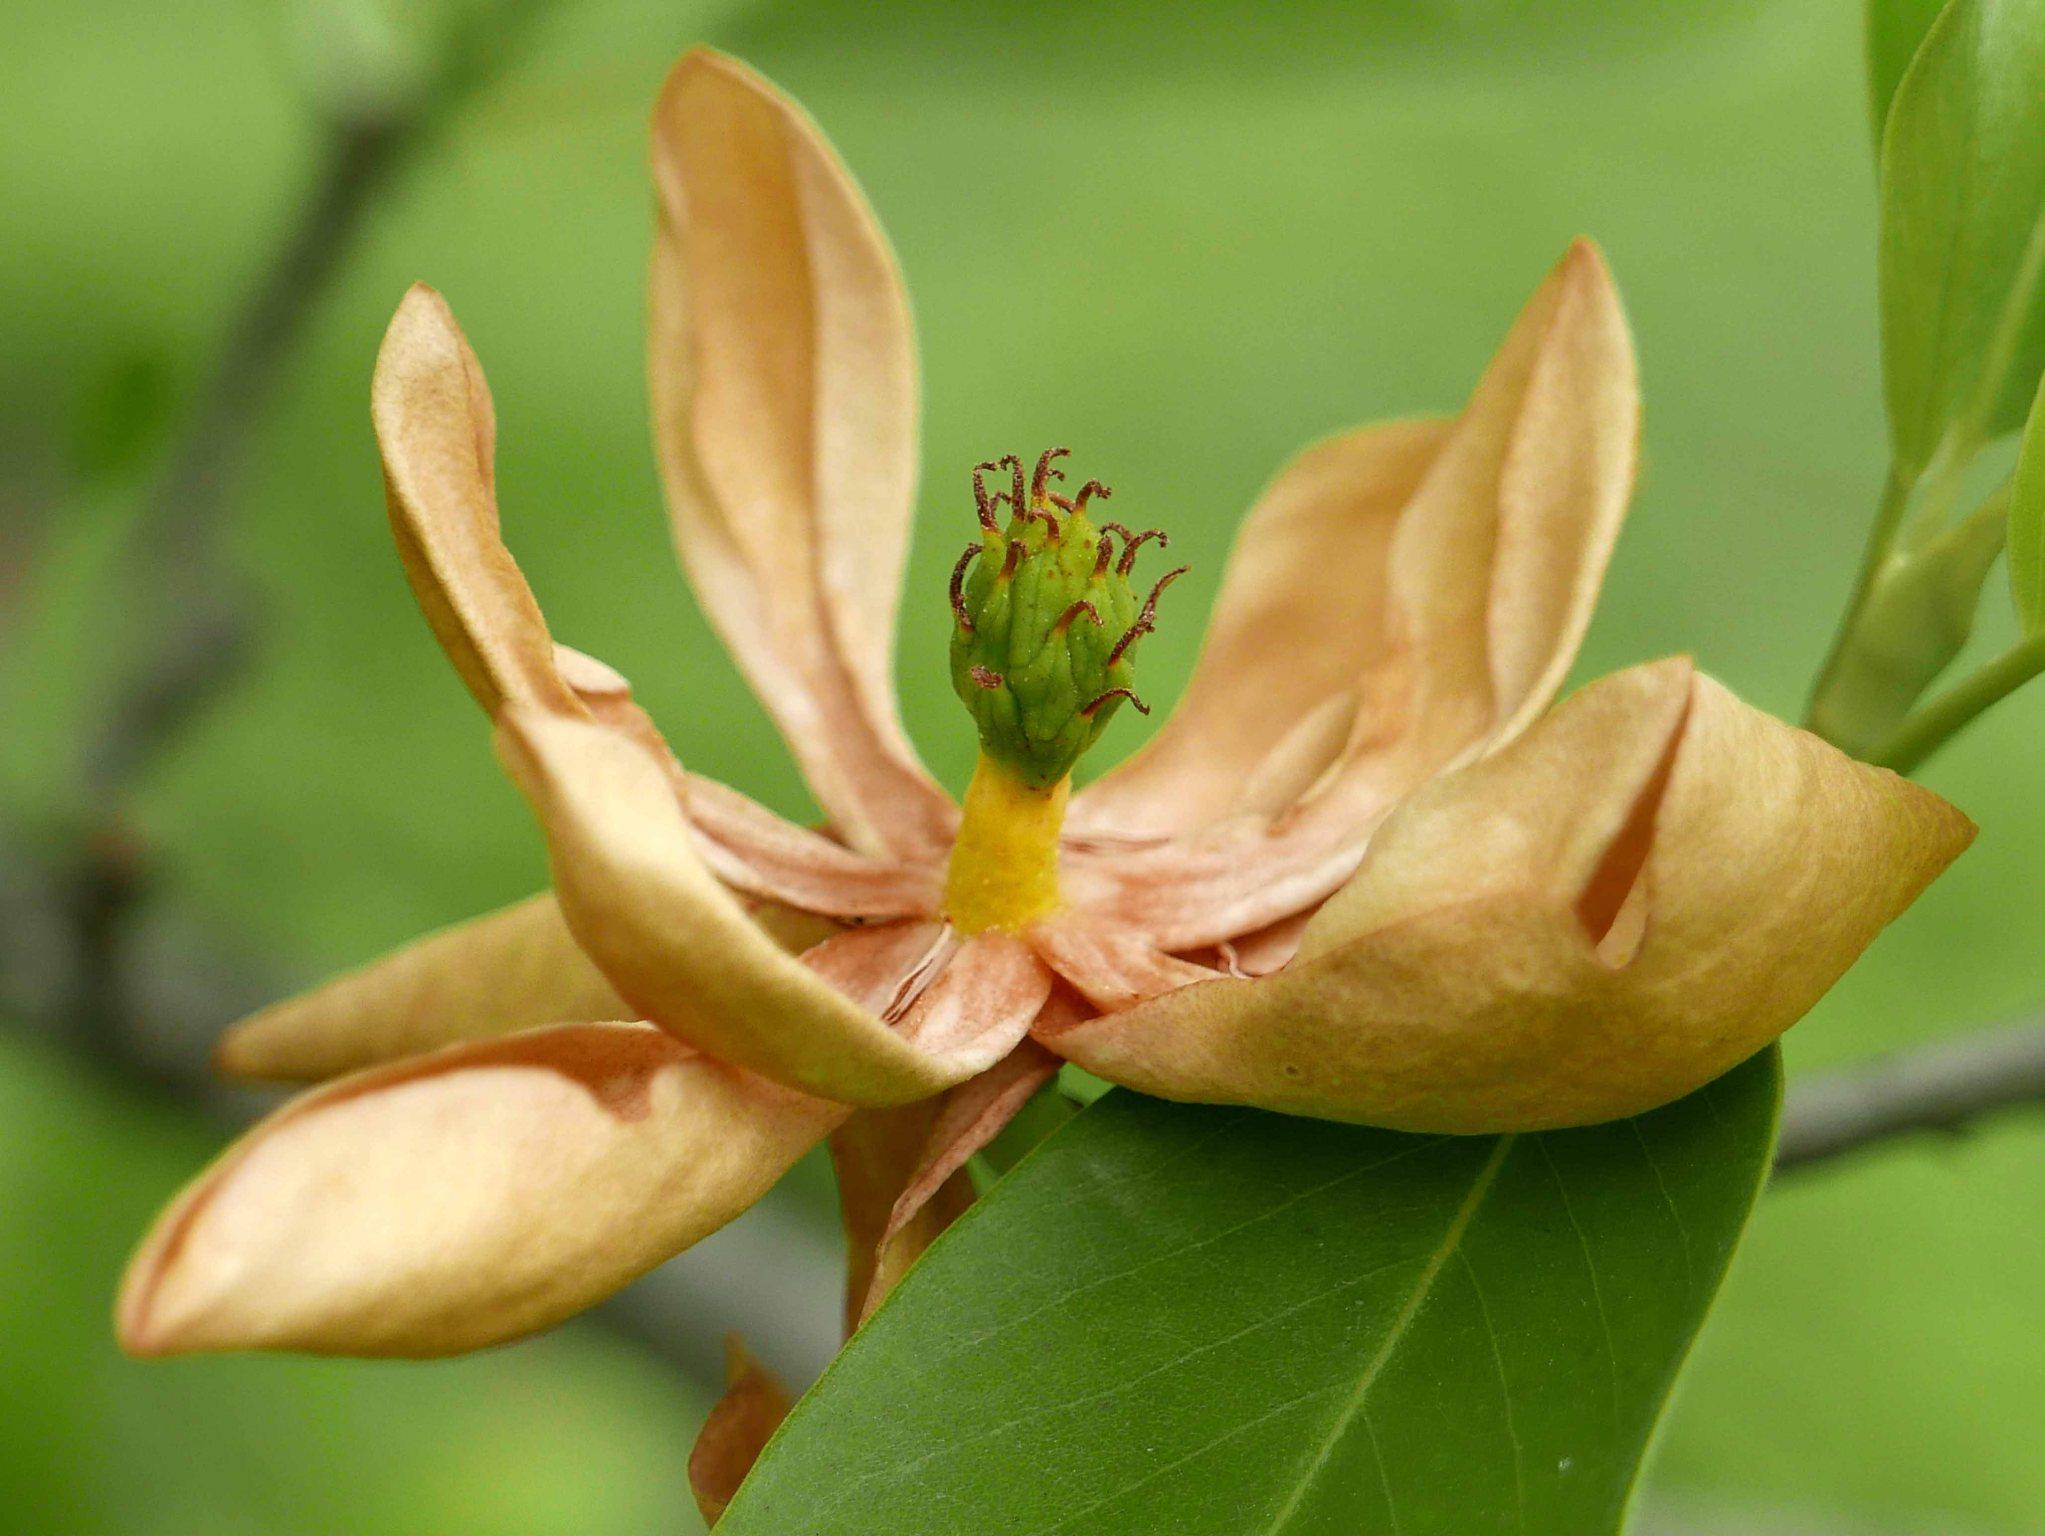 Magnolia virginiana spent flower and developing fruit. Photo © Mary Free, 2019-05-08, Simpson Gardens, Alexandria, VA.